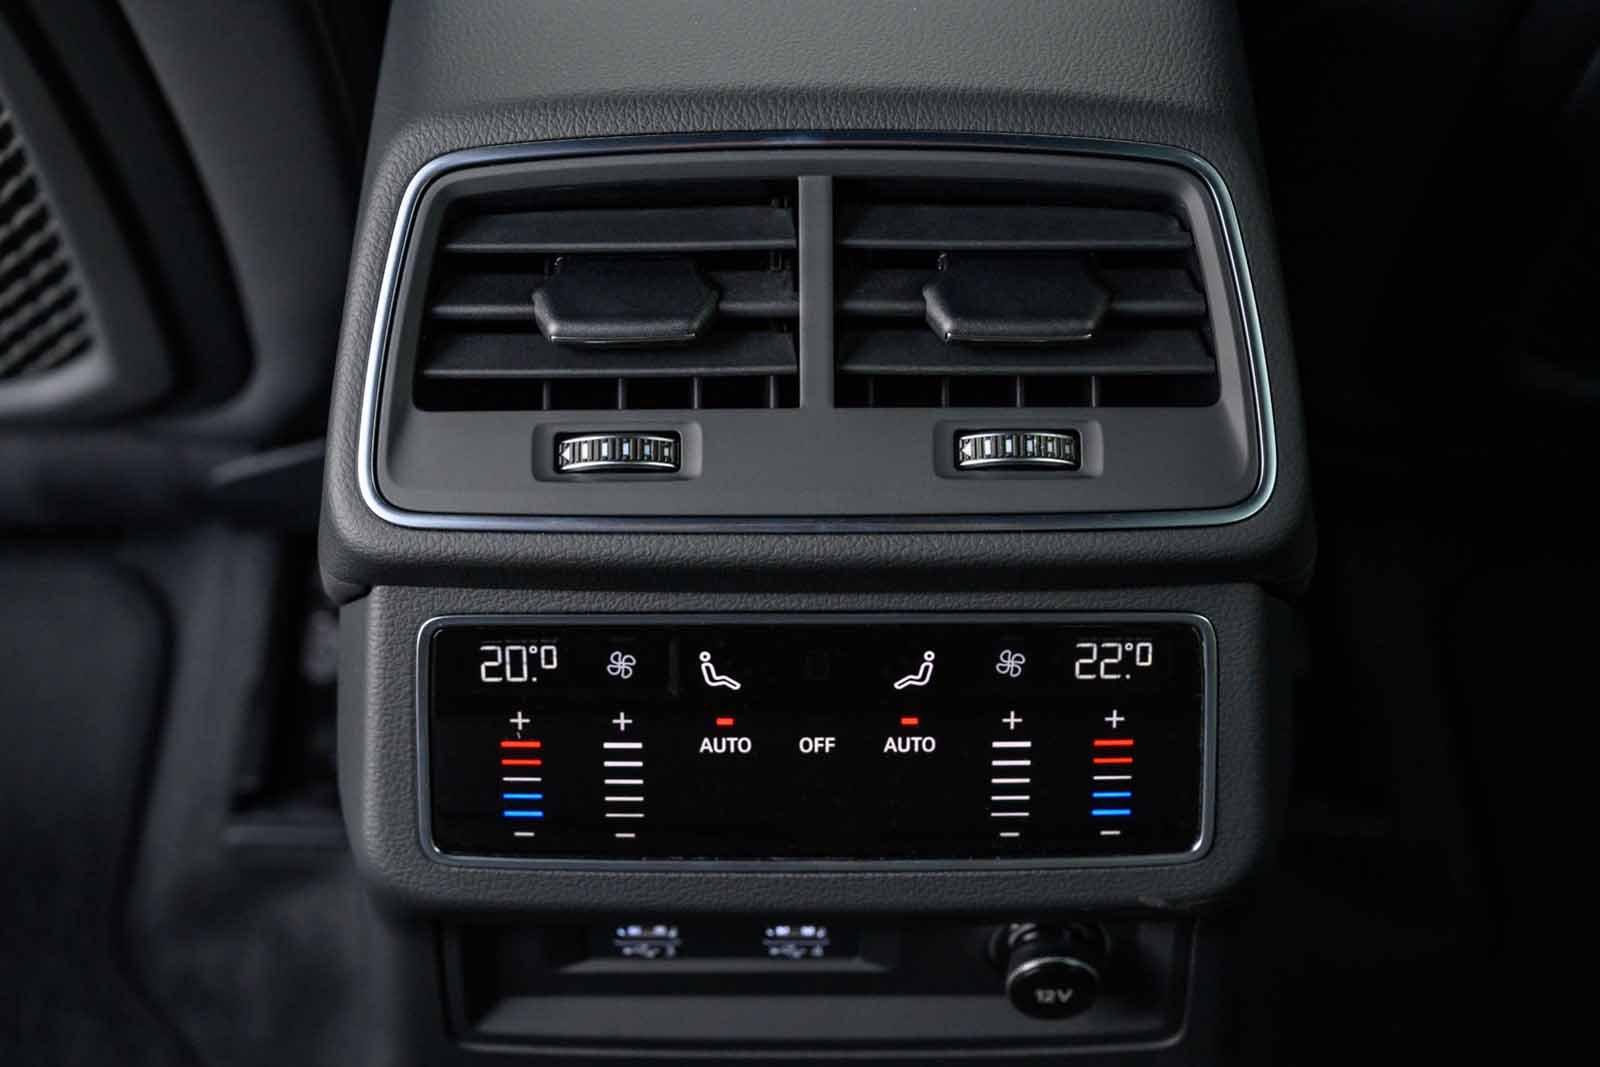 Audi Allroad 2019 RHD rear HVAC